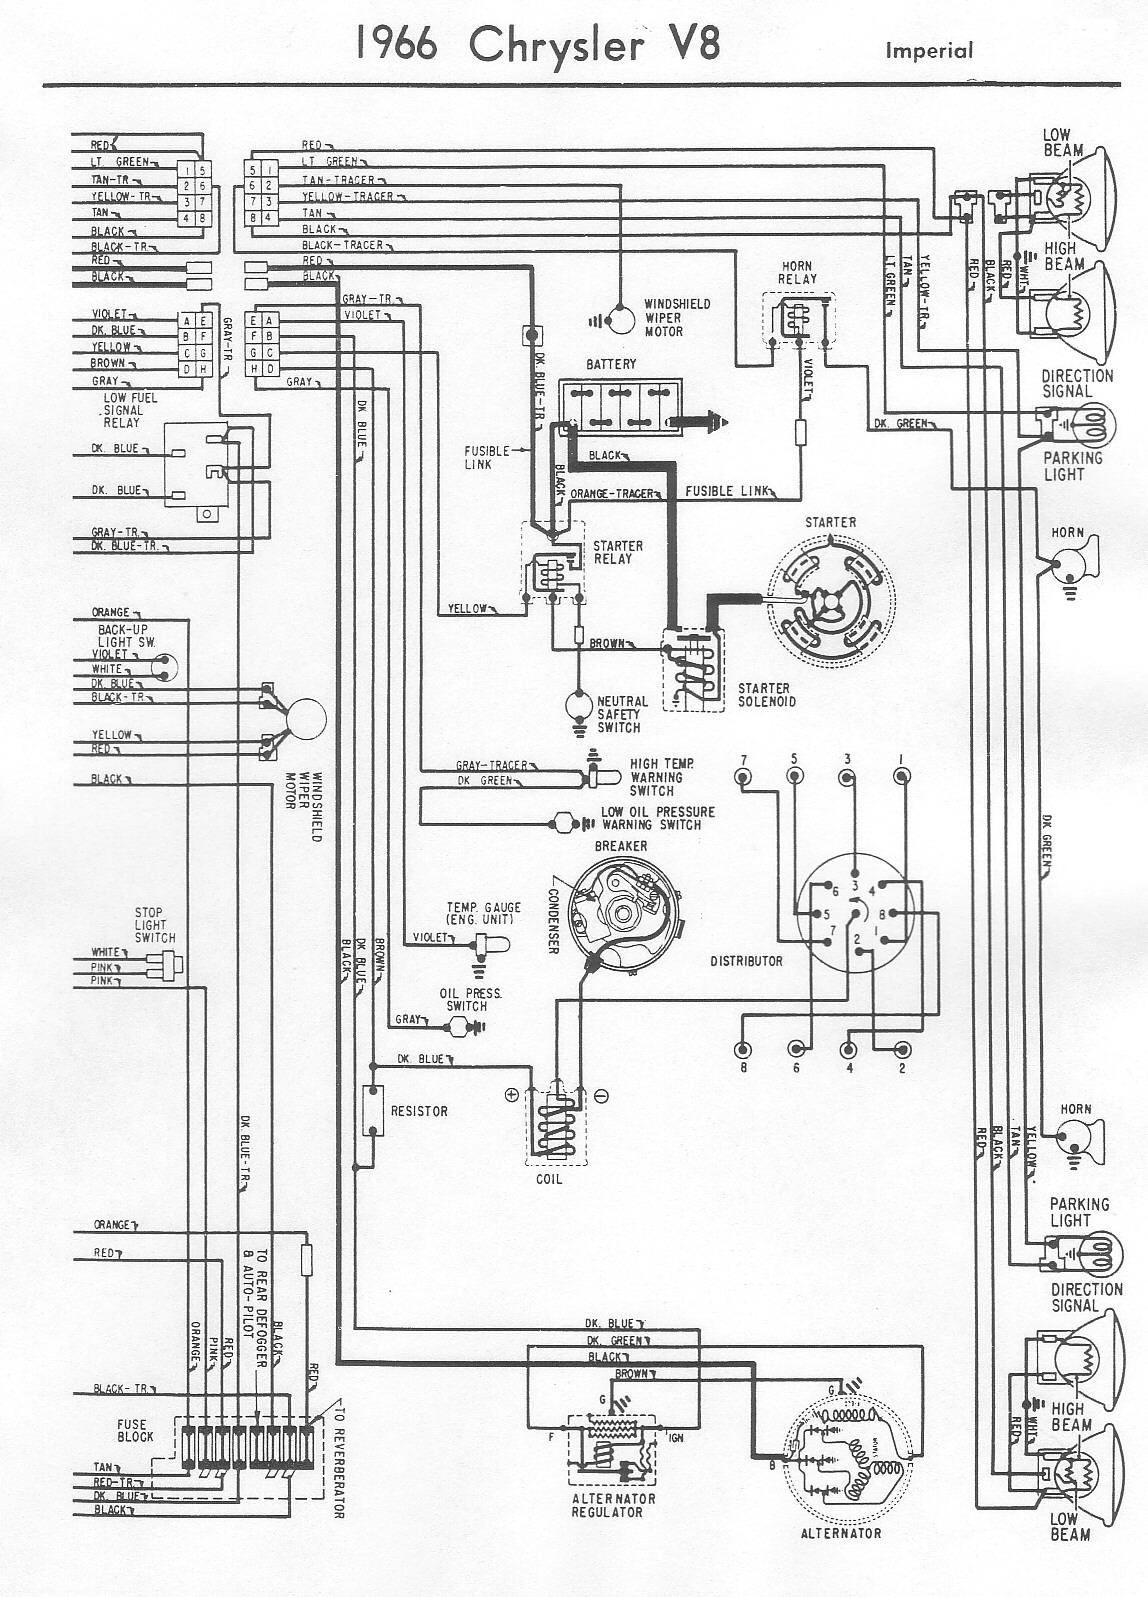 1966 Chrysler New Yorker Wiring Diagram - Catalogue of Schemas on 1978 dodge sportsman wiring diagram, 1978 dodge ram wiring diagram, 1978 dodge 440 wiring diagram, 1978 ford f100 wiring diagram, 1978 dodge magnum wiring diagram,